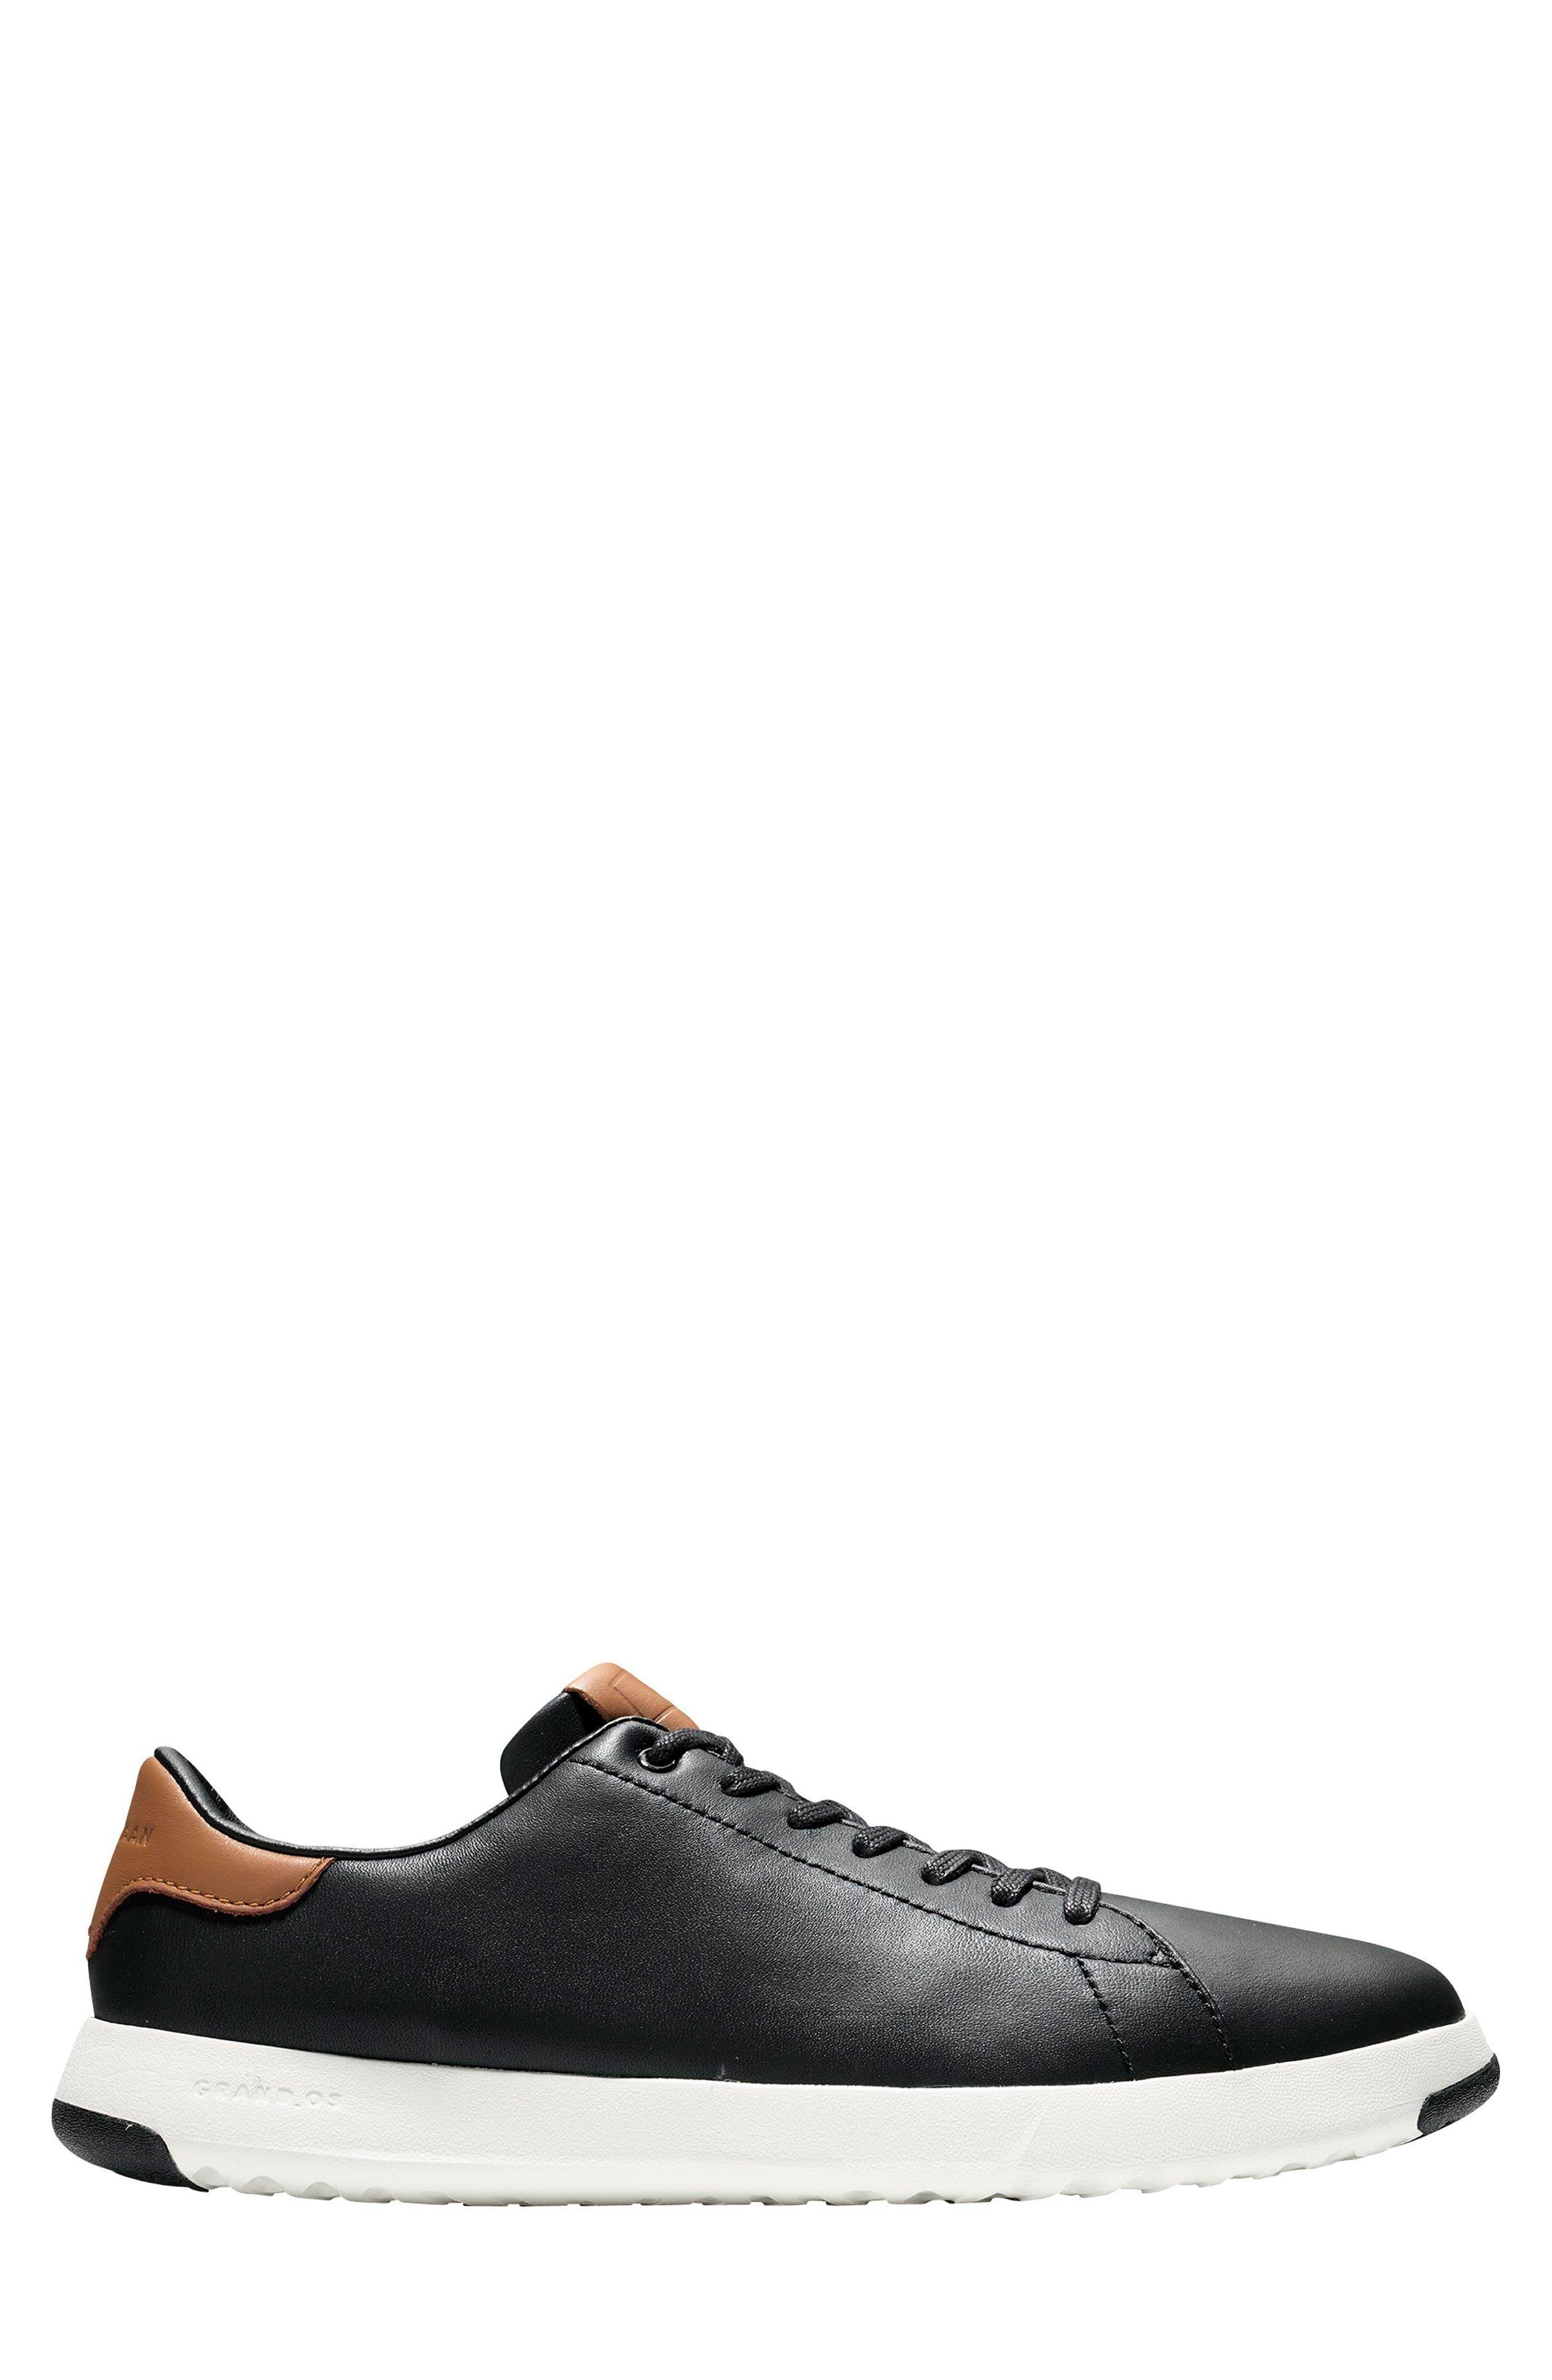 GrandPro Tennis Sneaker,                             Alternate thumbnail 3, color,                             BLACK/ BRITISH TAN